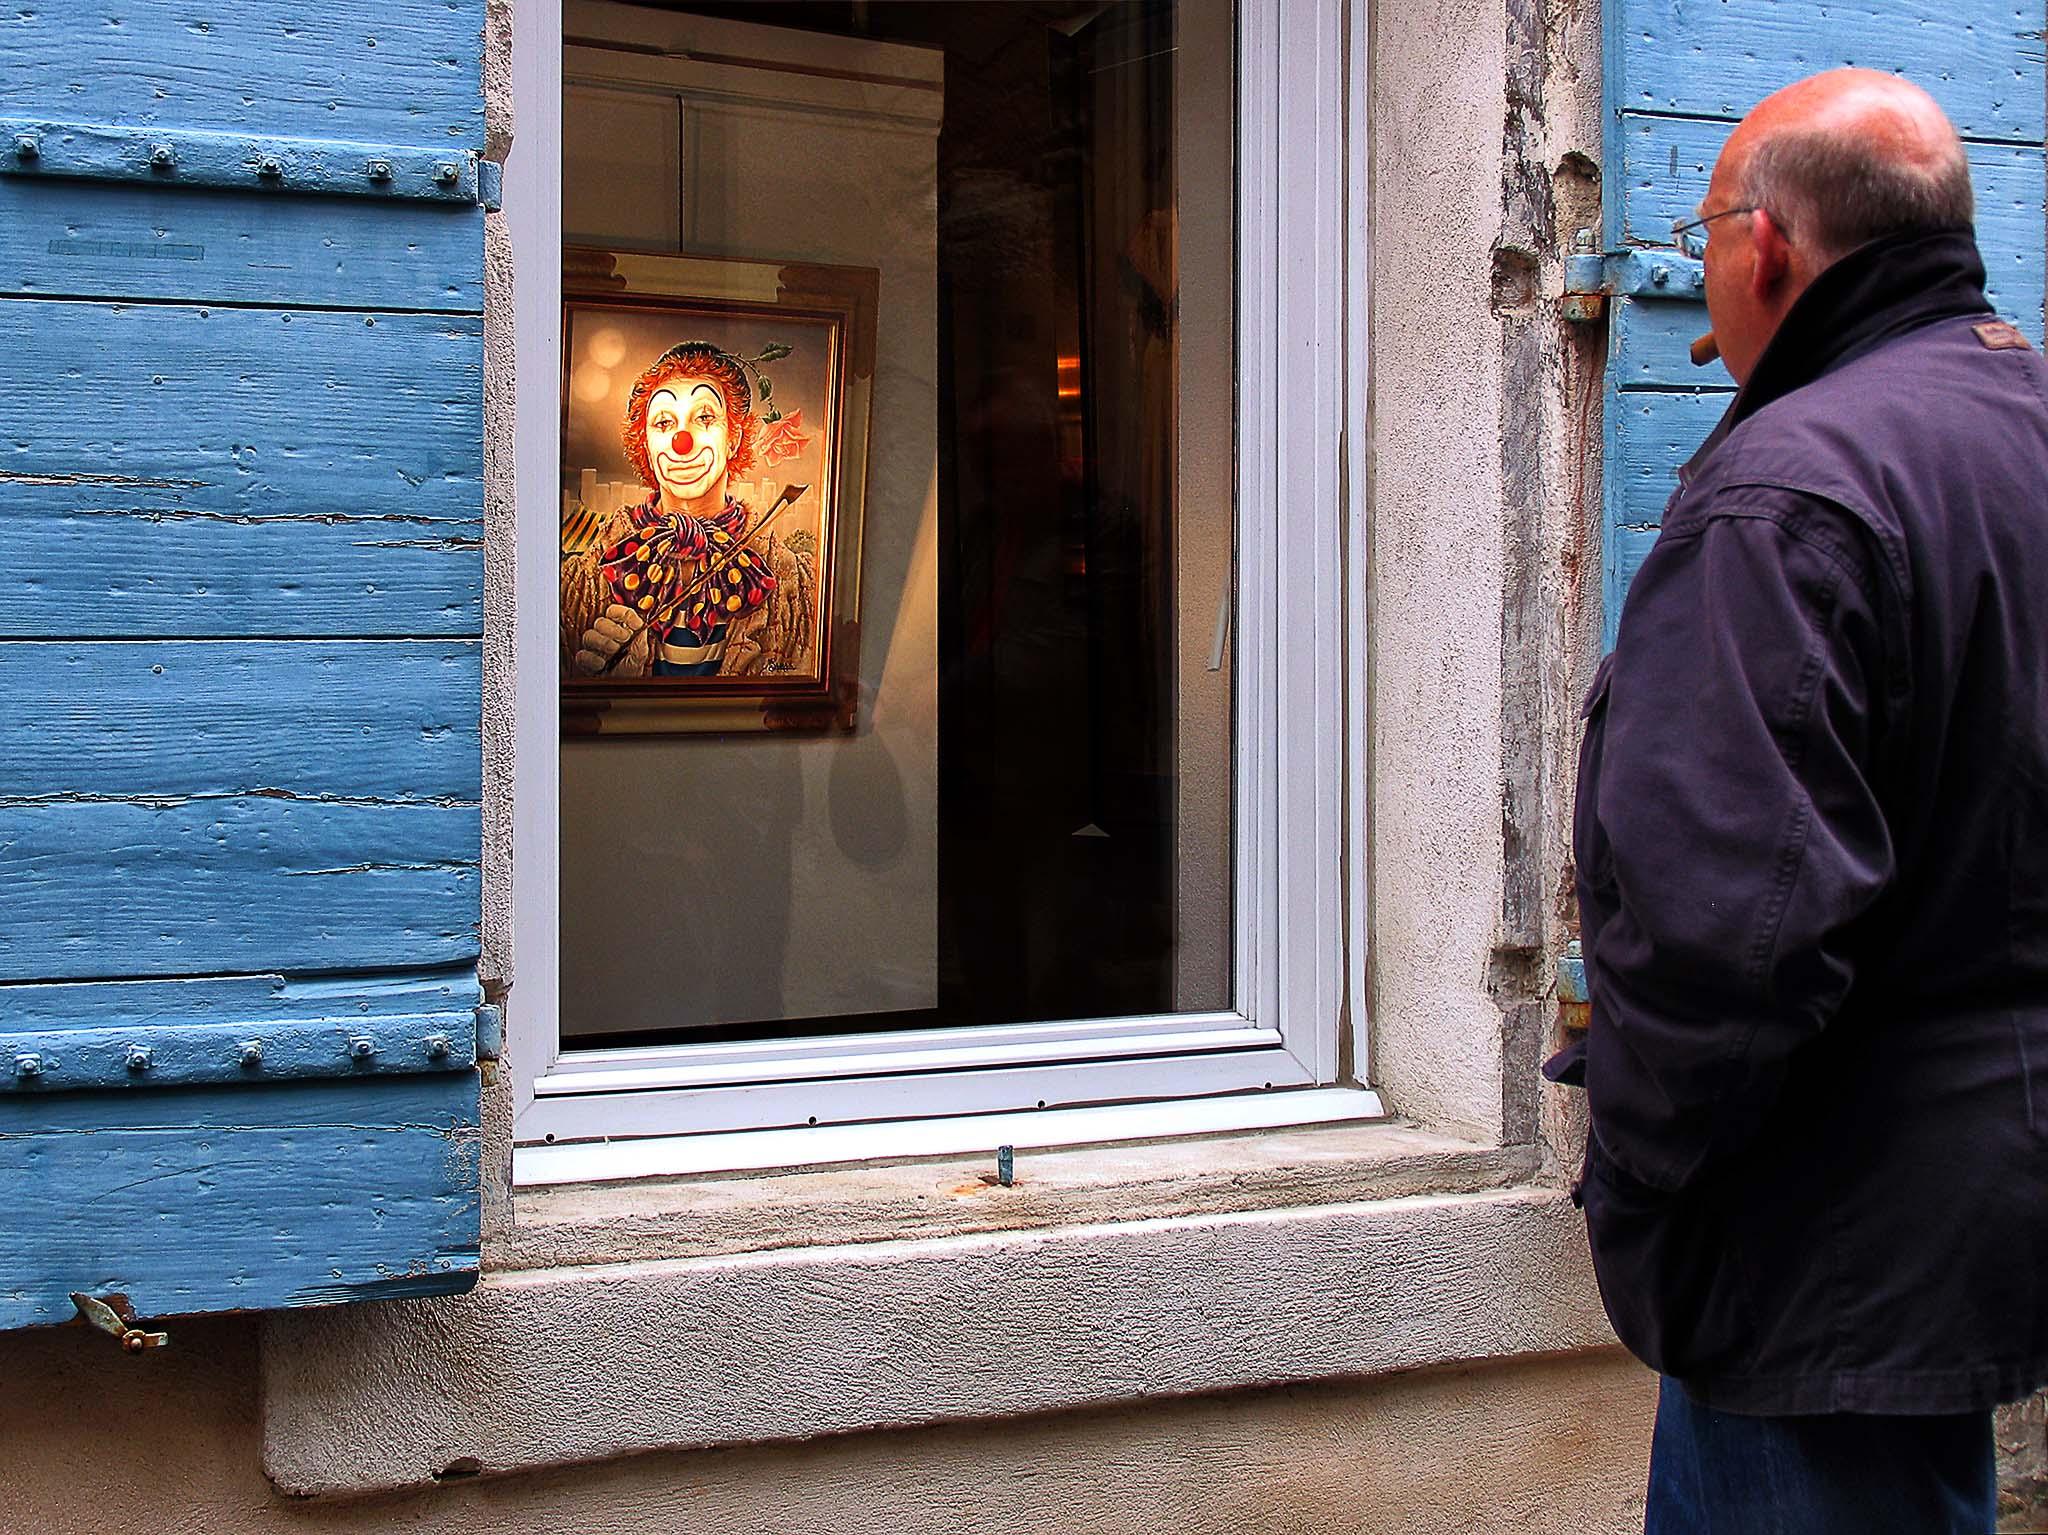 Melinda Isachsen JANIS Photography & Fine Art museum St Remy de Provence France